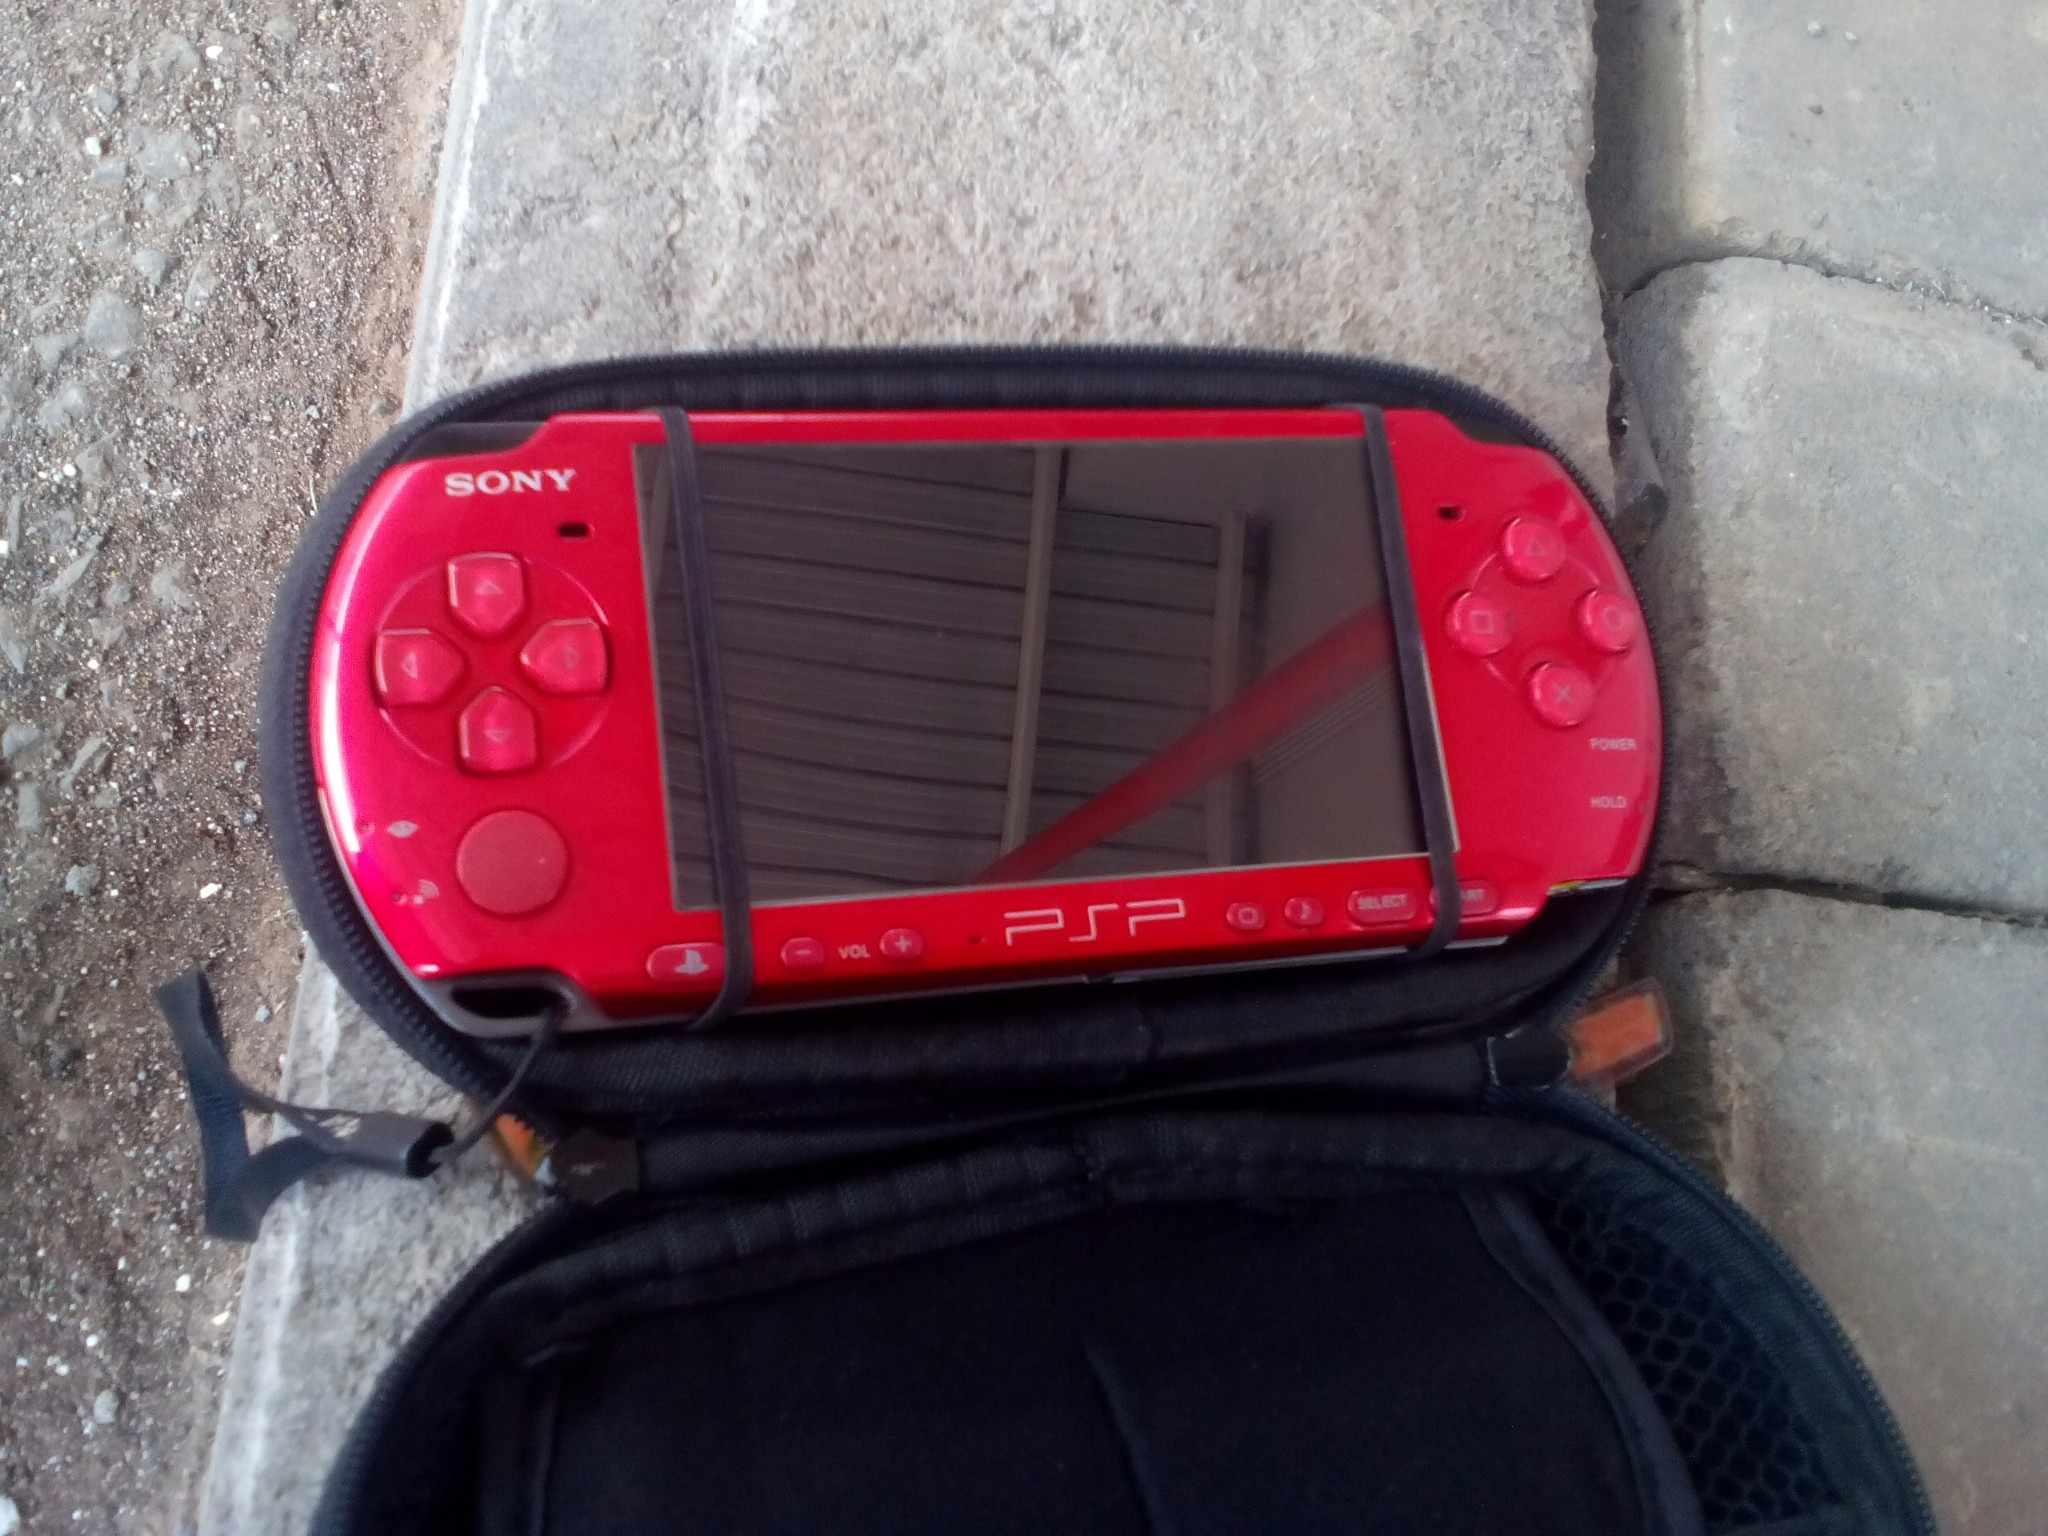 Sony psp 2004